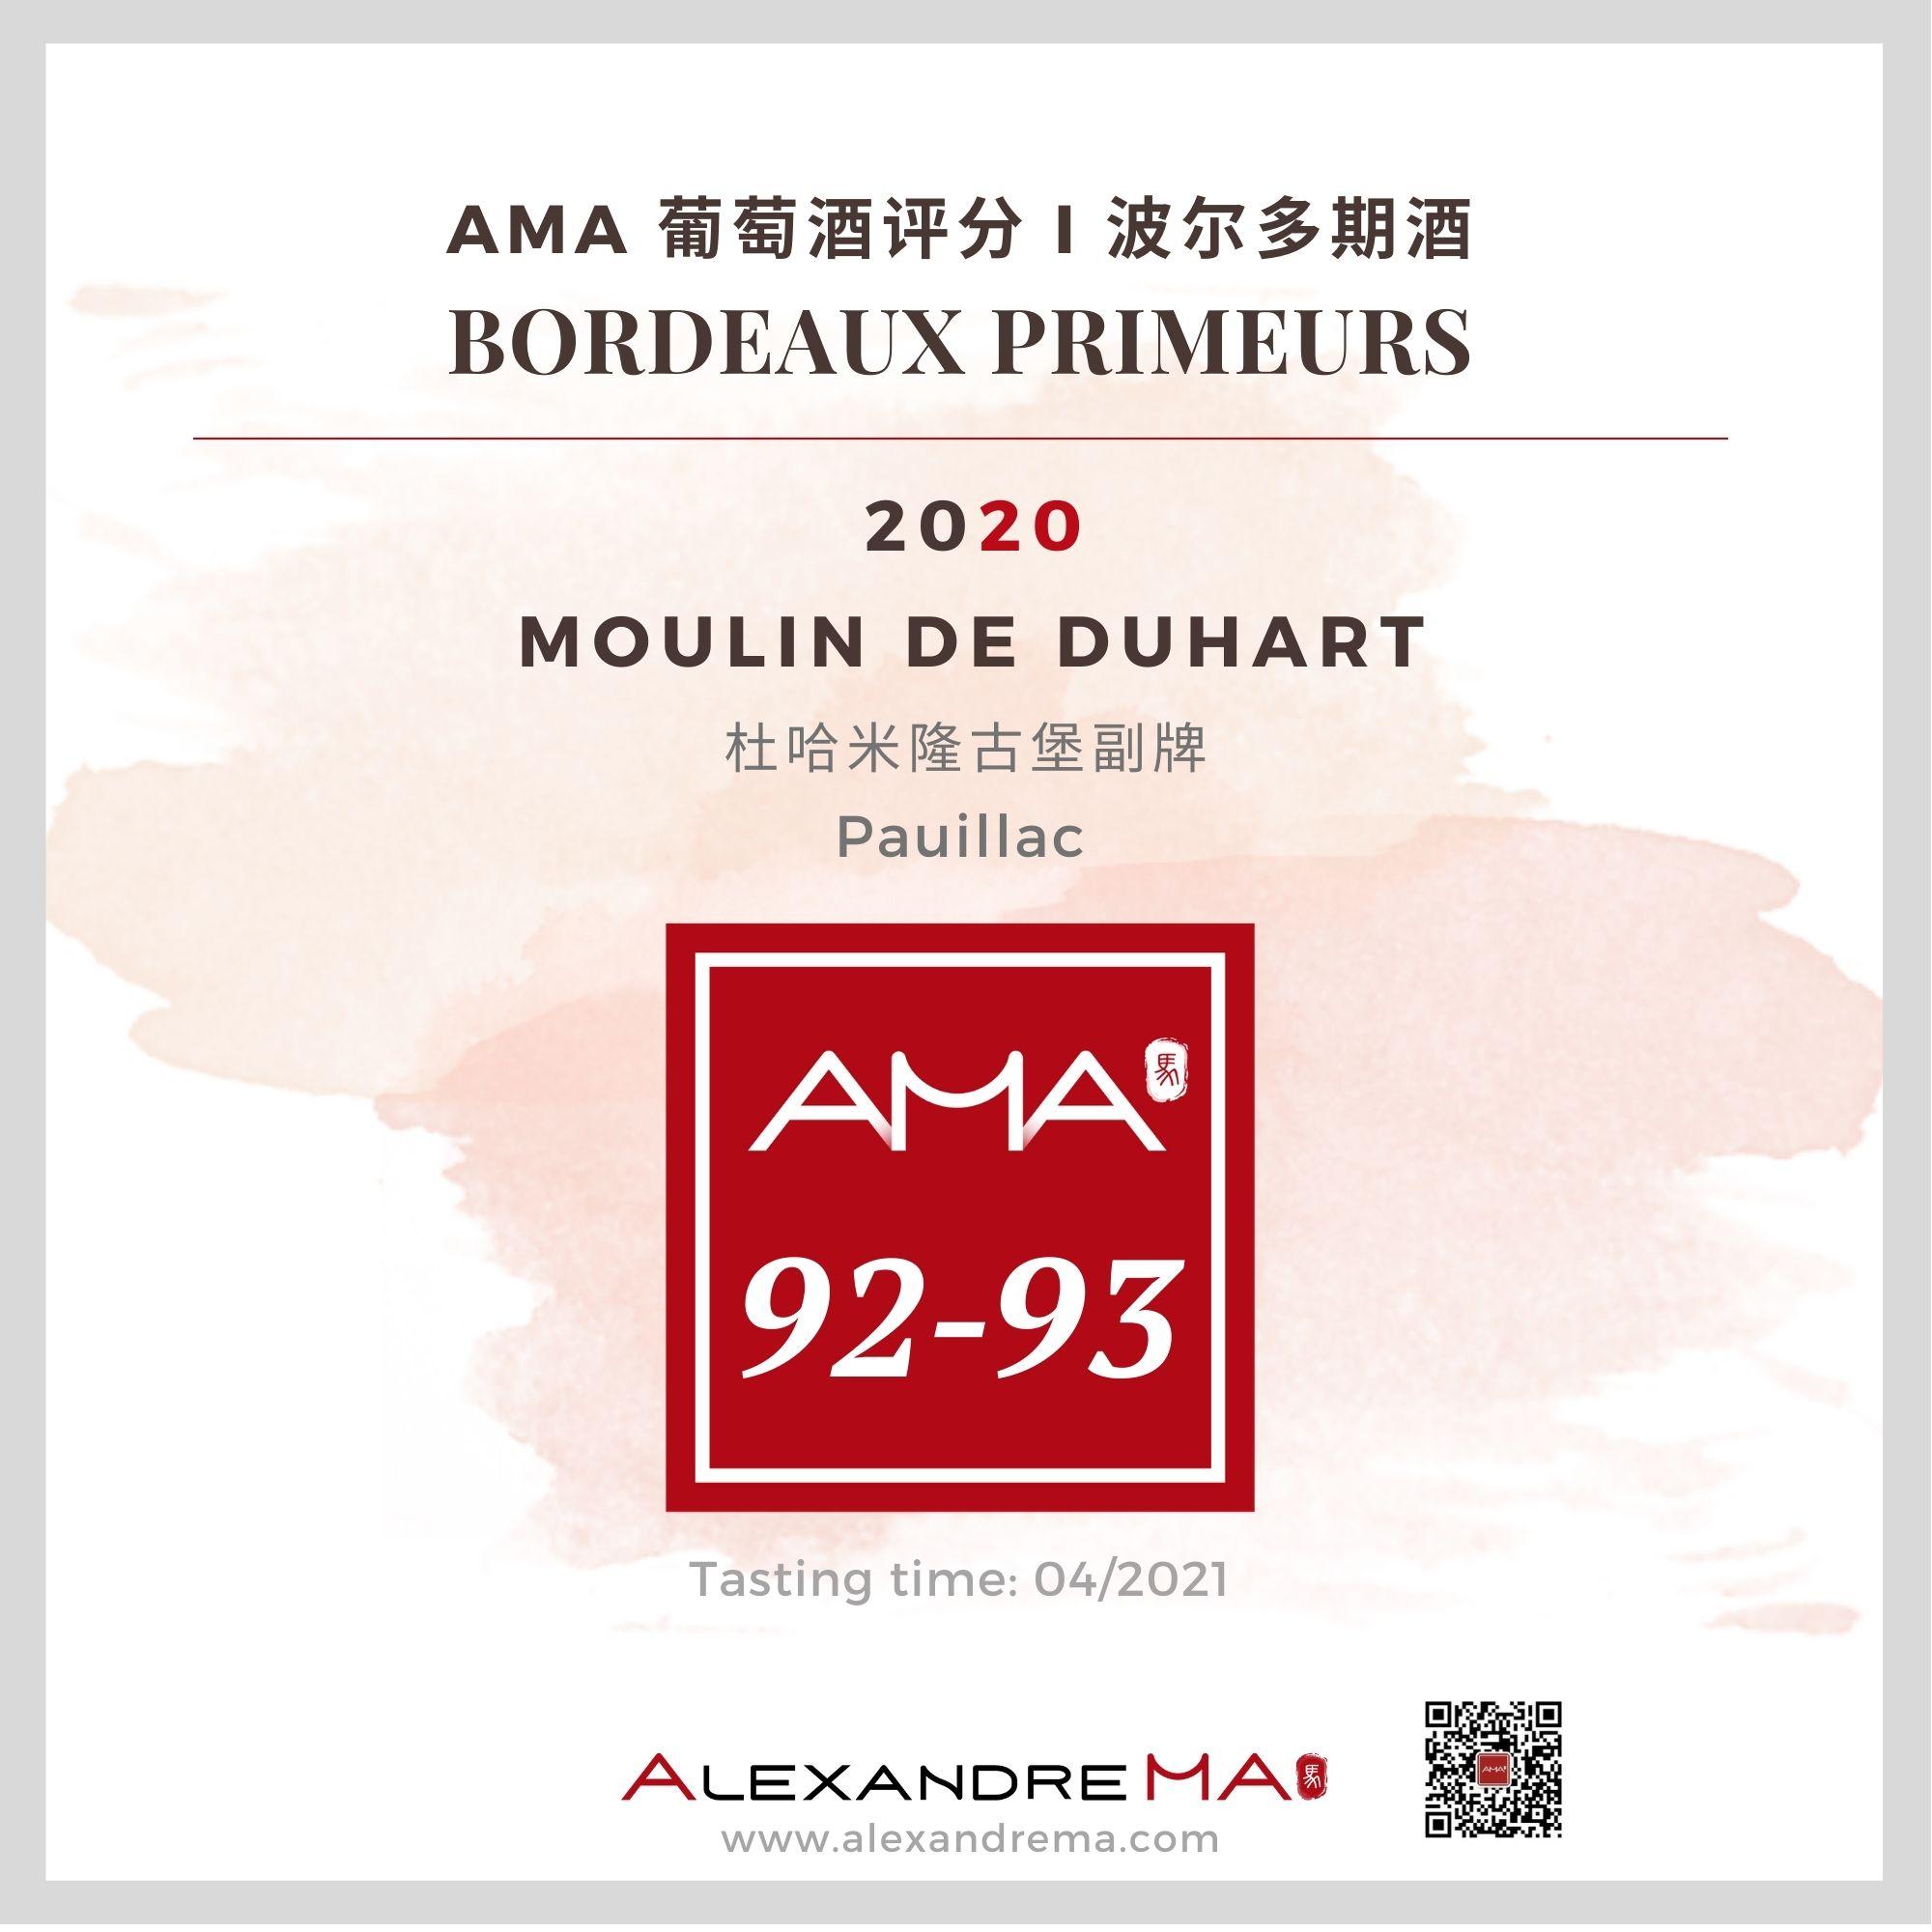 Château Duhart-Moulin de Duhart 2020 - Alexandre MA